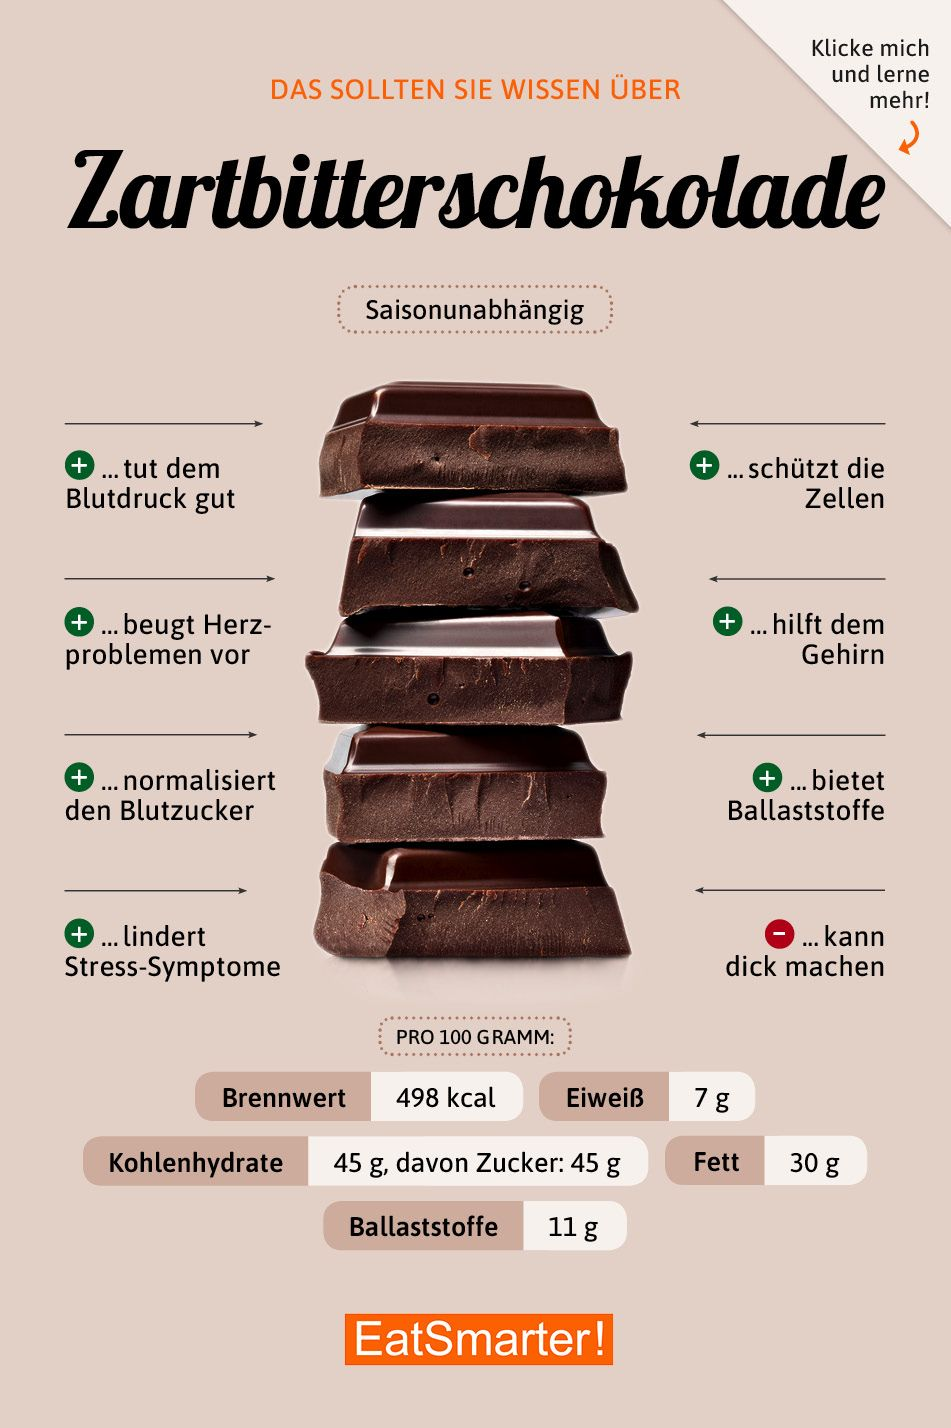 Schokolade #foodtips